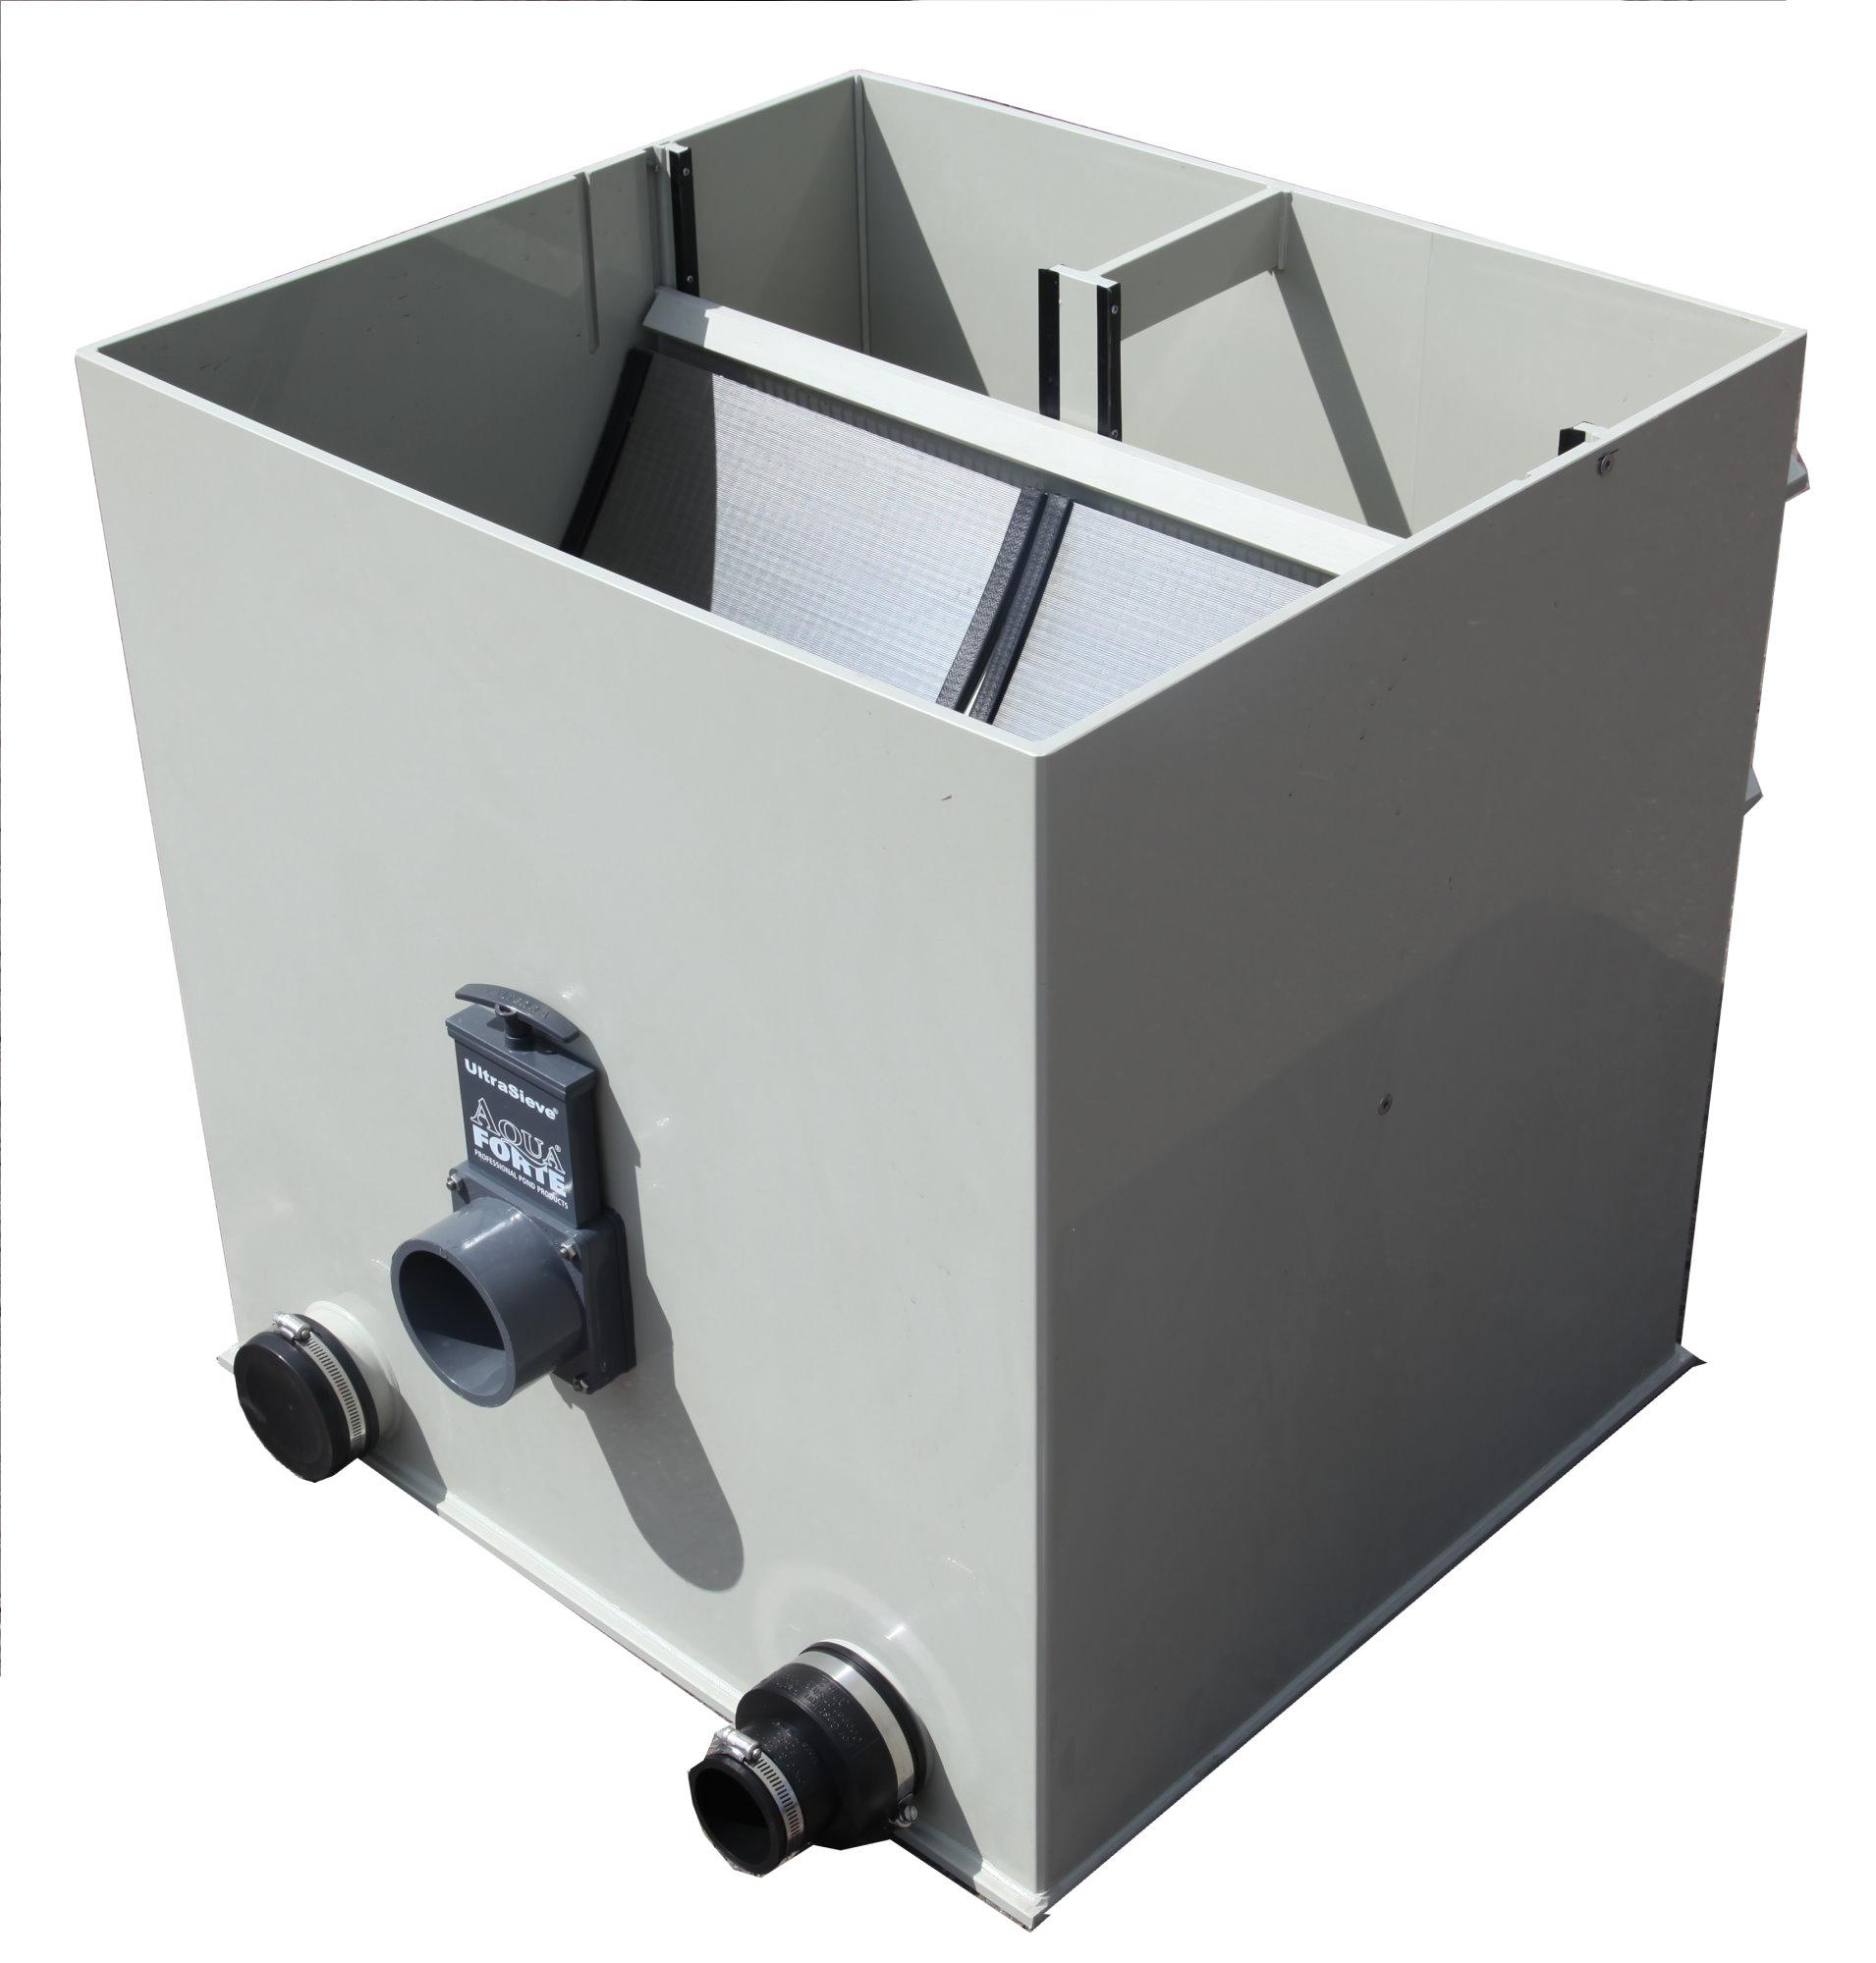 Aquaforte - UltraSieve extra breit 300 µm